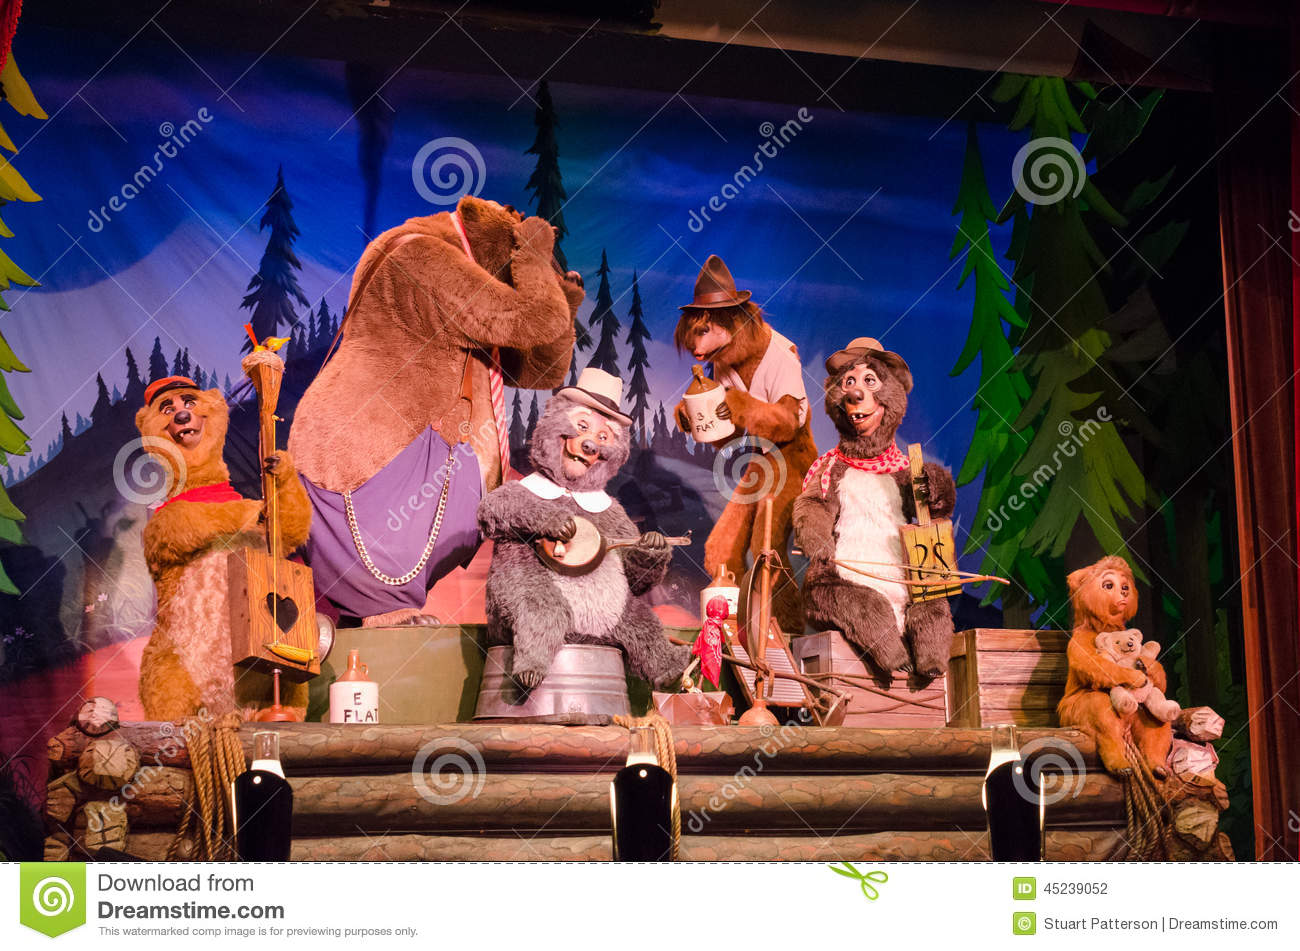 Disney Country Bear Jamberee Clipart.